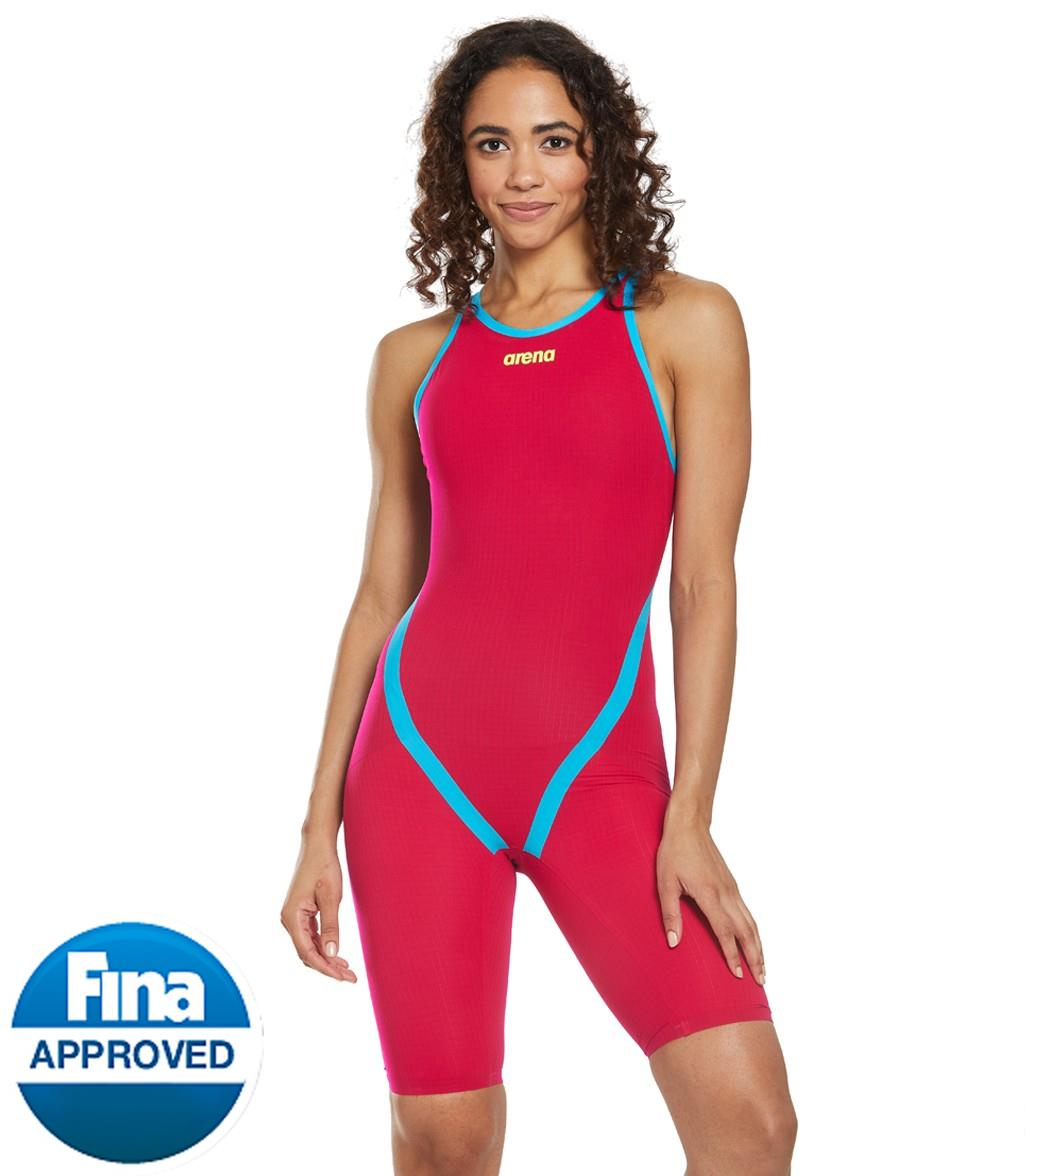 e8b7e85b7 Arena Powerskin Carbon Flex VX Open Back Tech Swimsuit at SwimOutlet.com -  Free Shipping